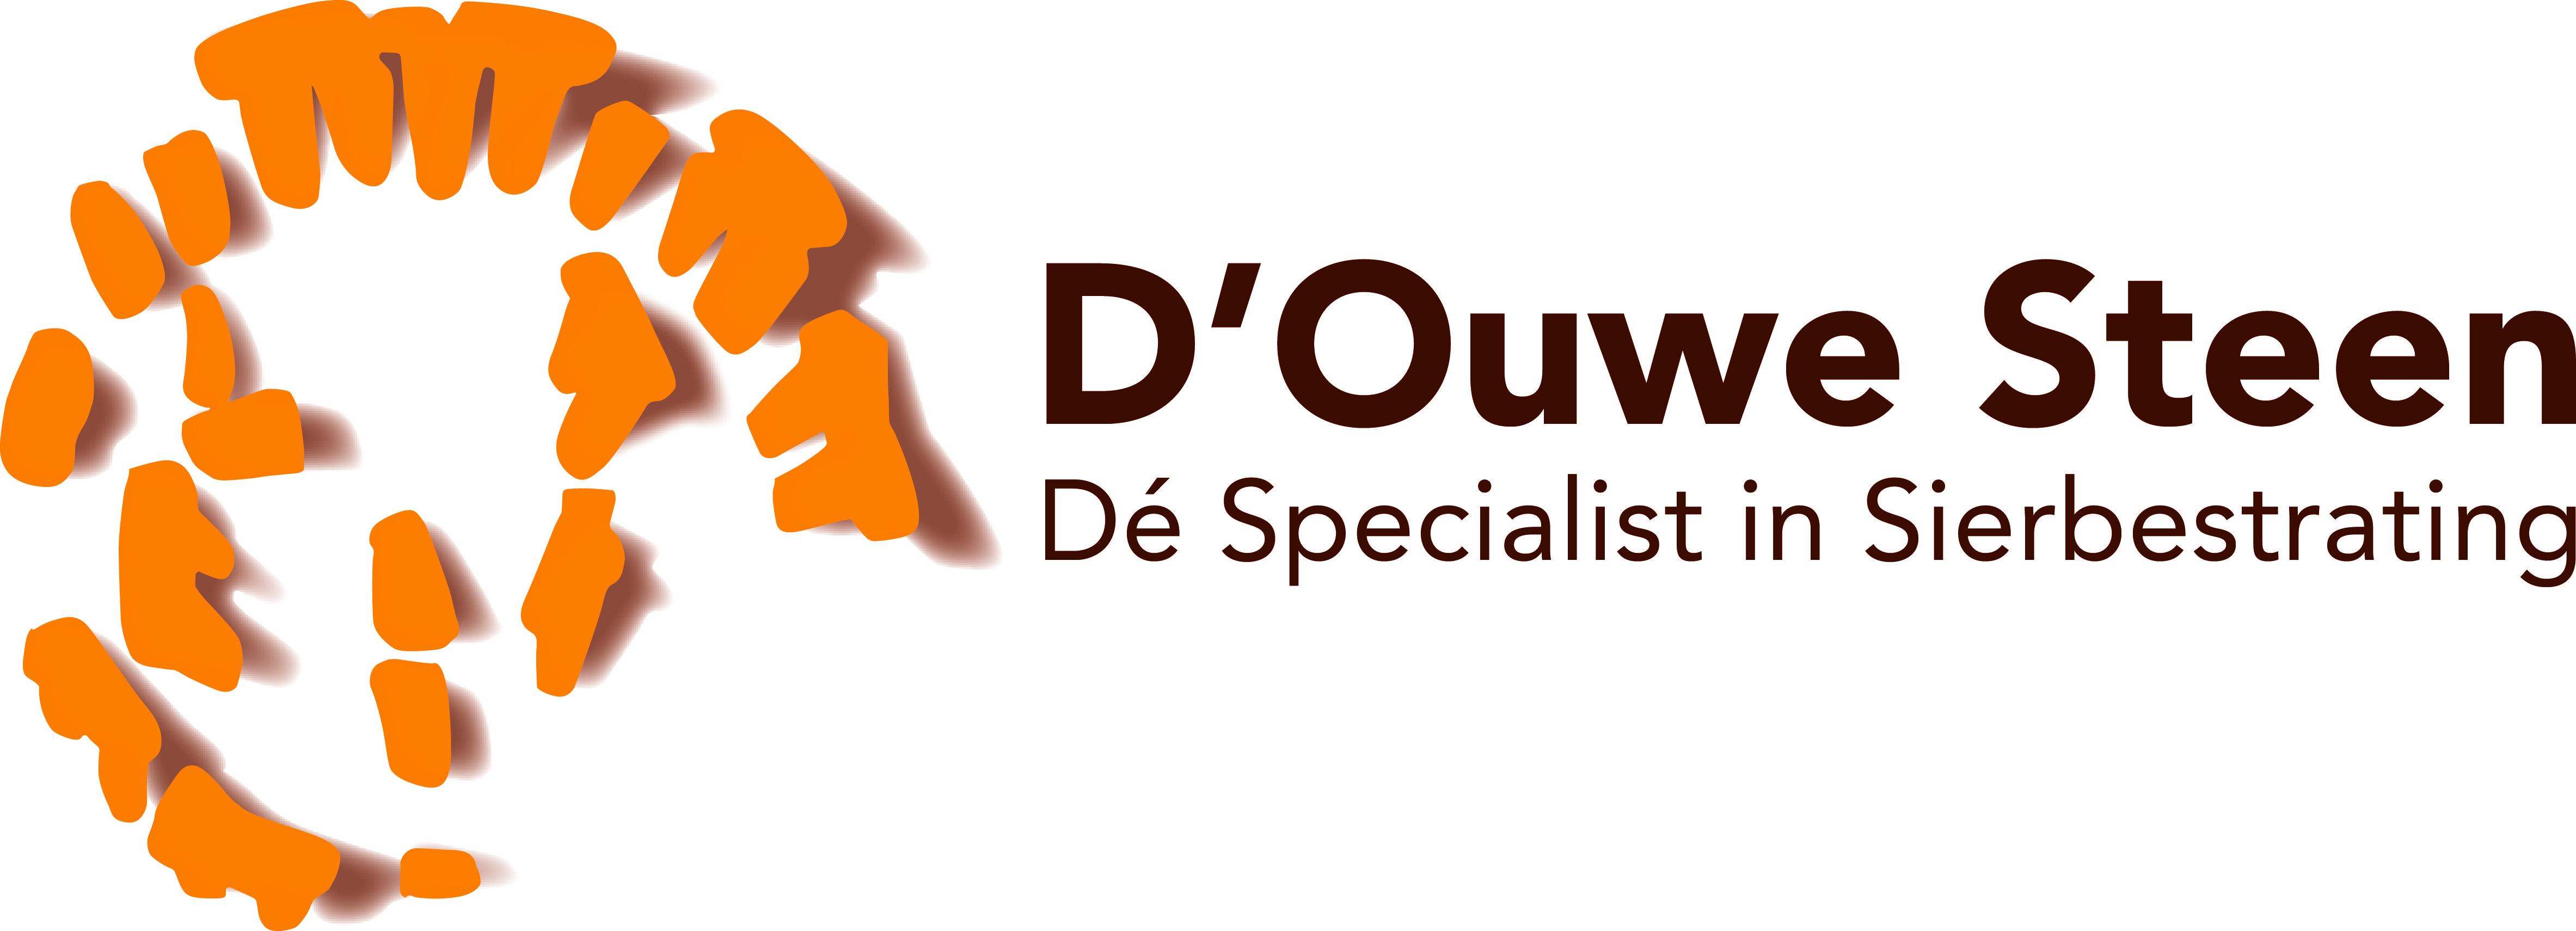 D'Ouwe Steen